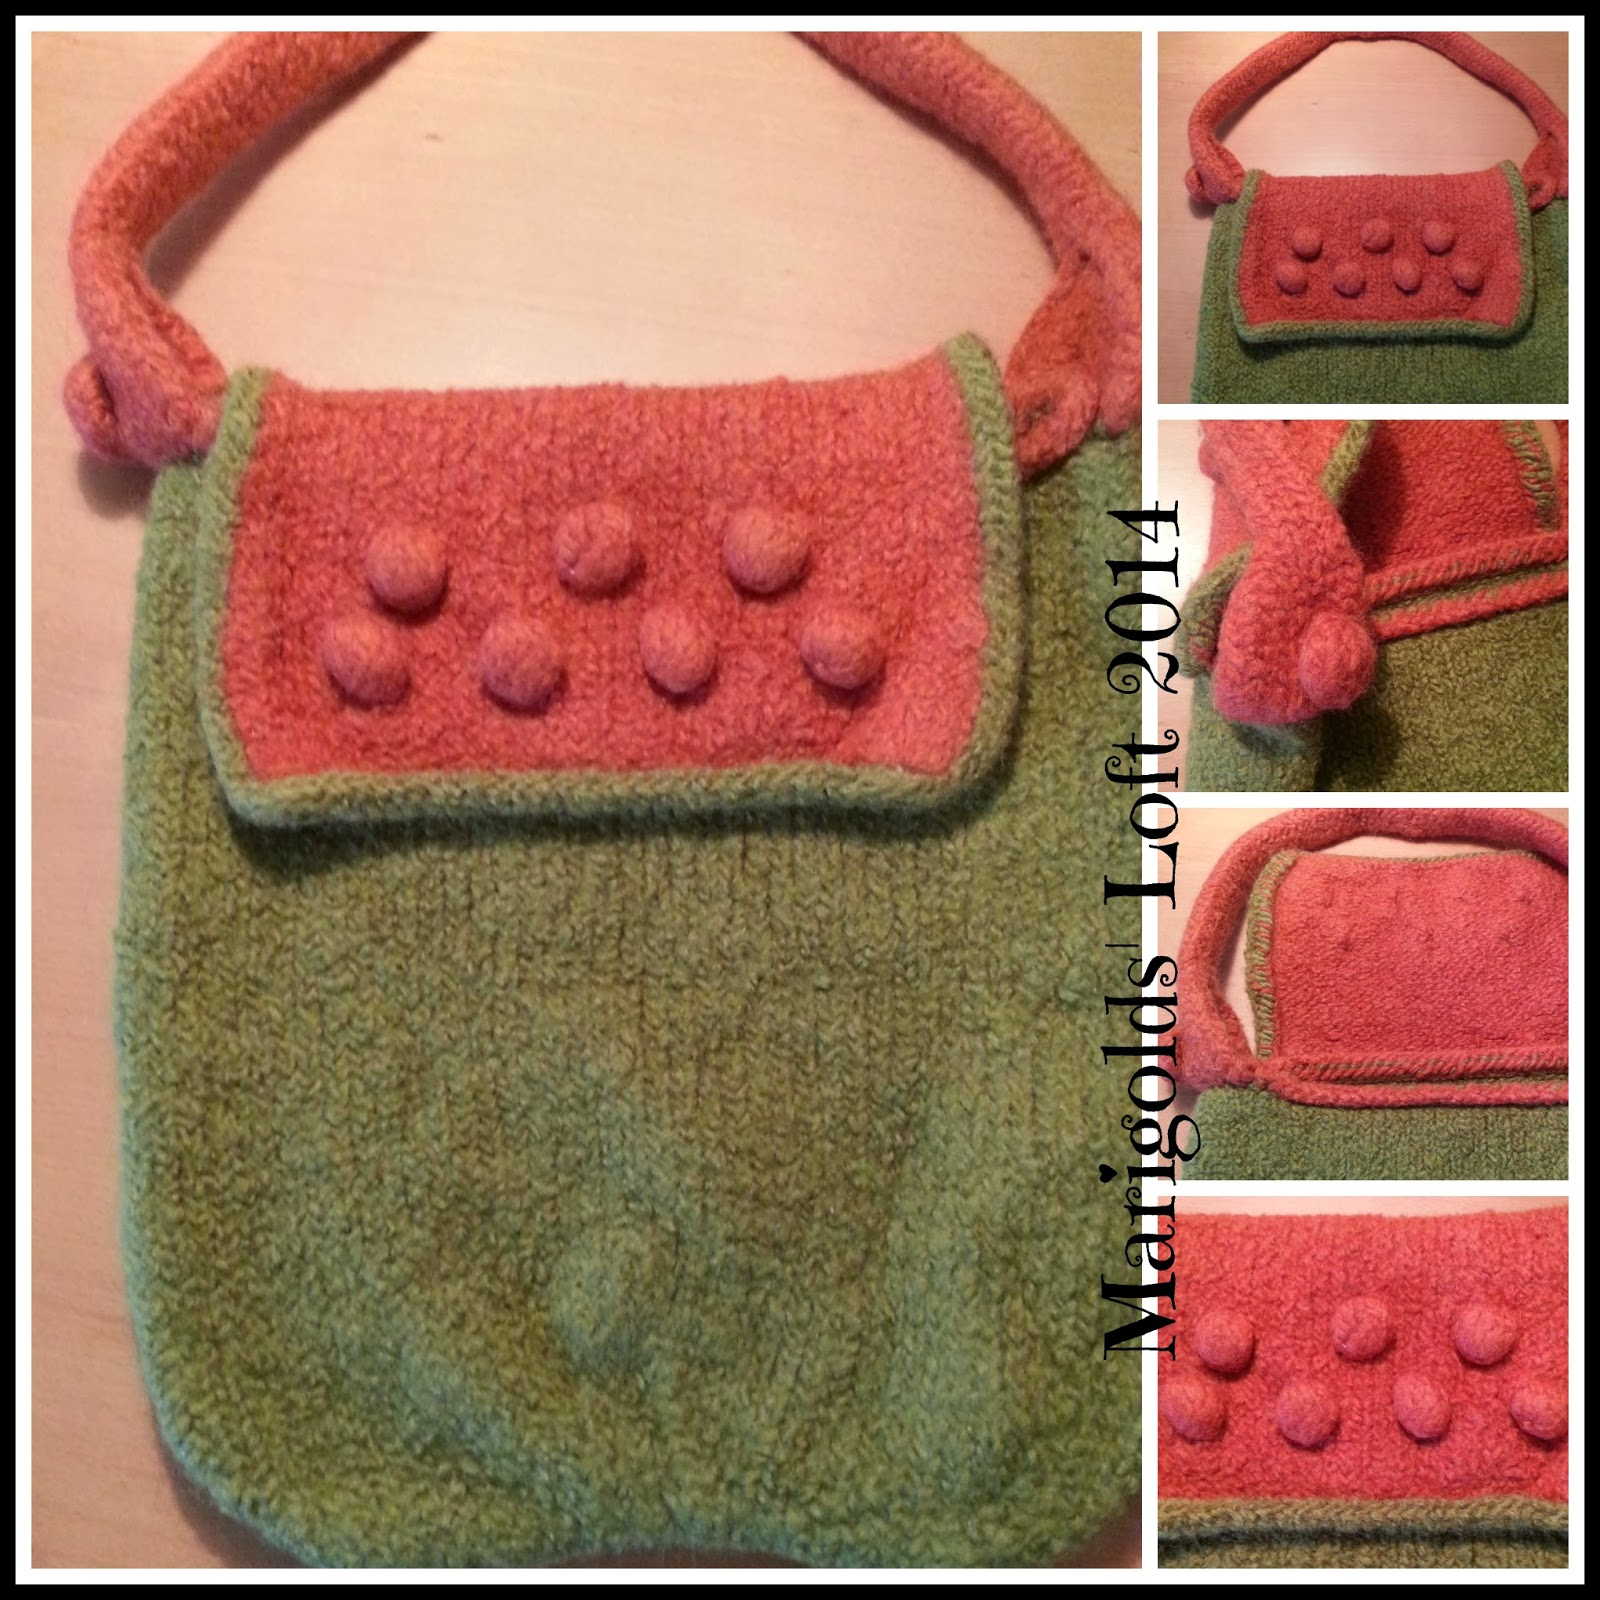 felted bag tutorial step-by-step